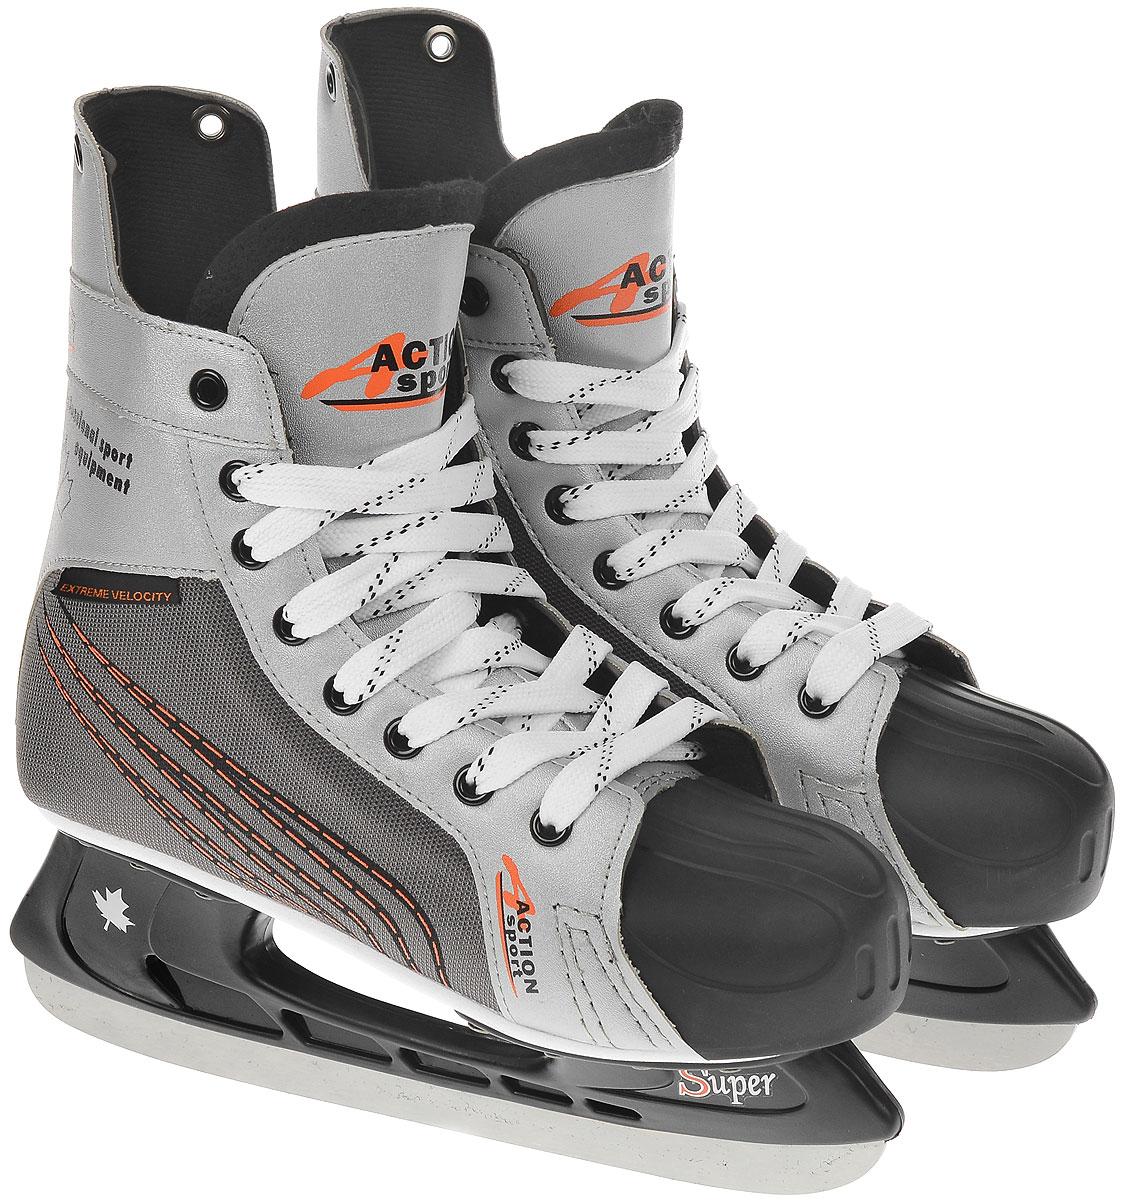 Коньки хоккейные мужские Action, цвет: белый, серый. PW-216N. Размер 41